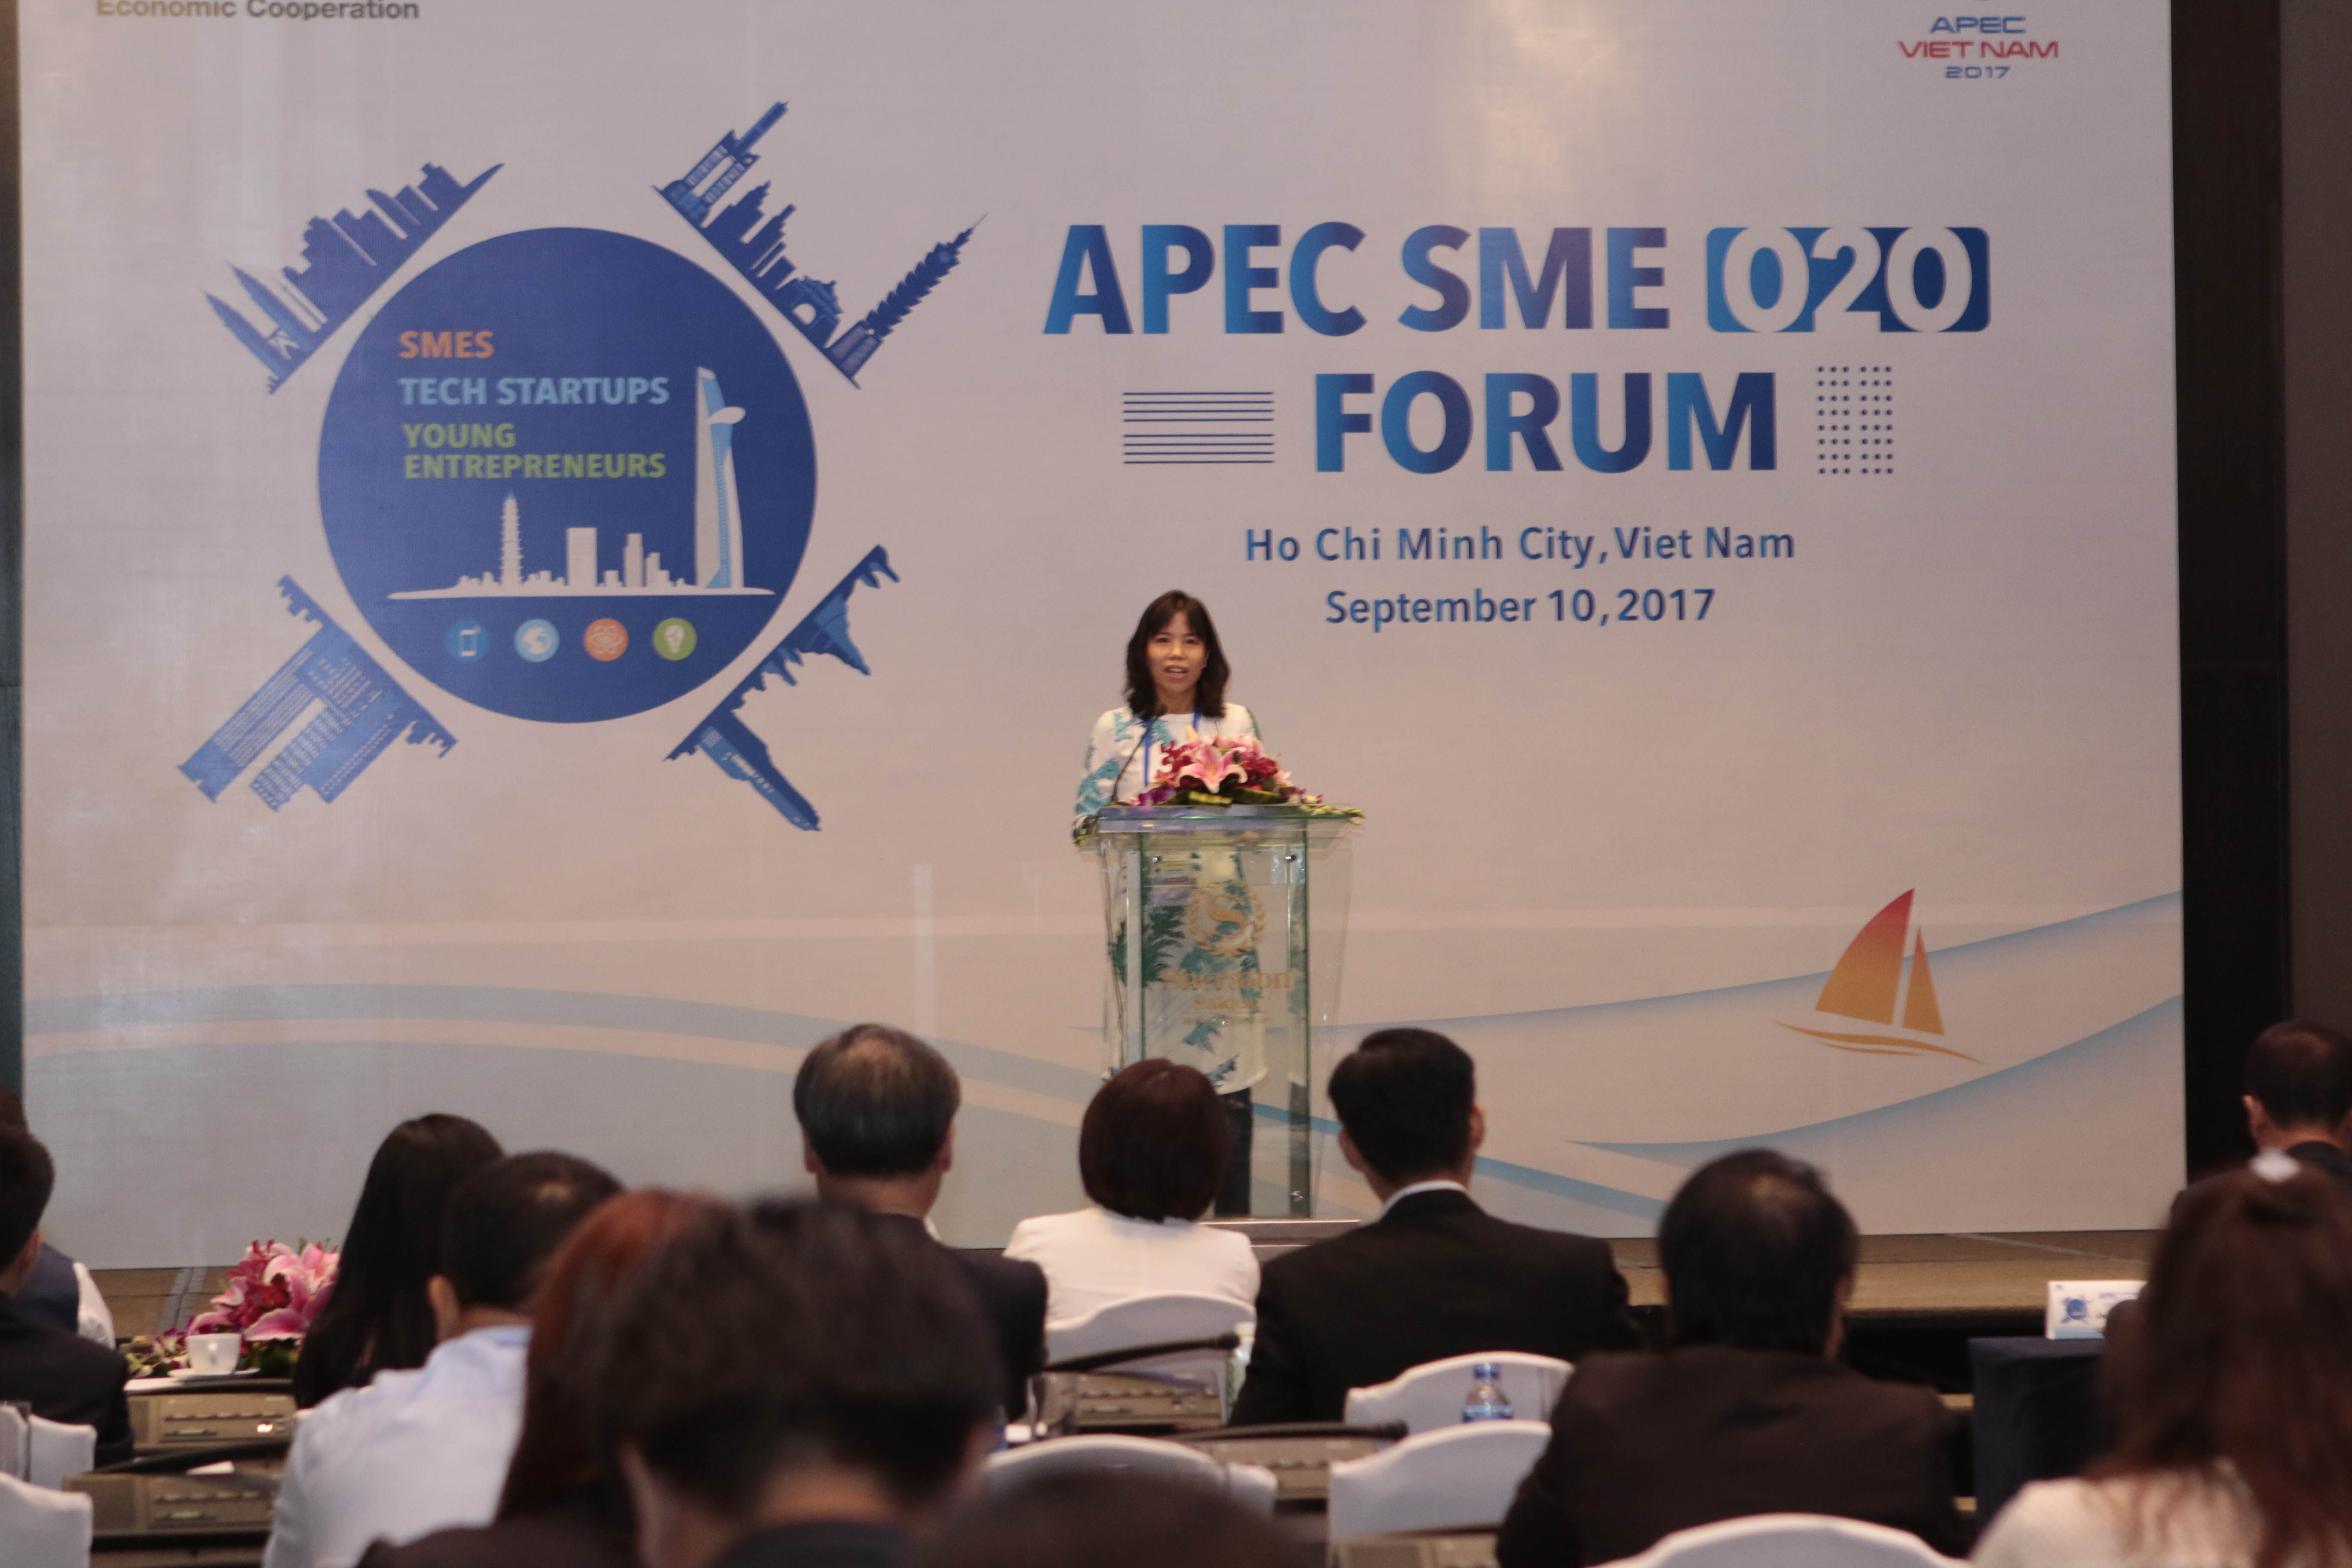 APEC 020 Forum:为提高新企业数字技术竞争力做出贡献